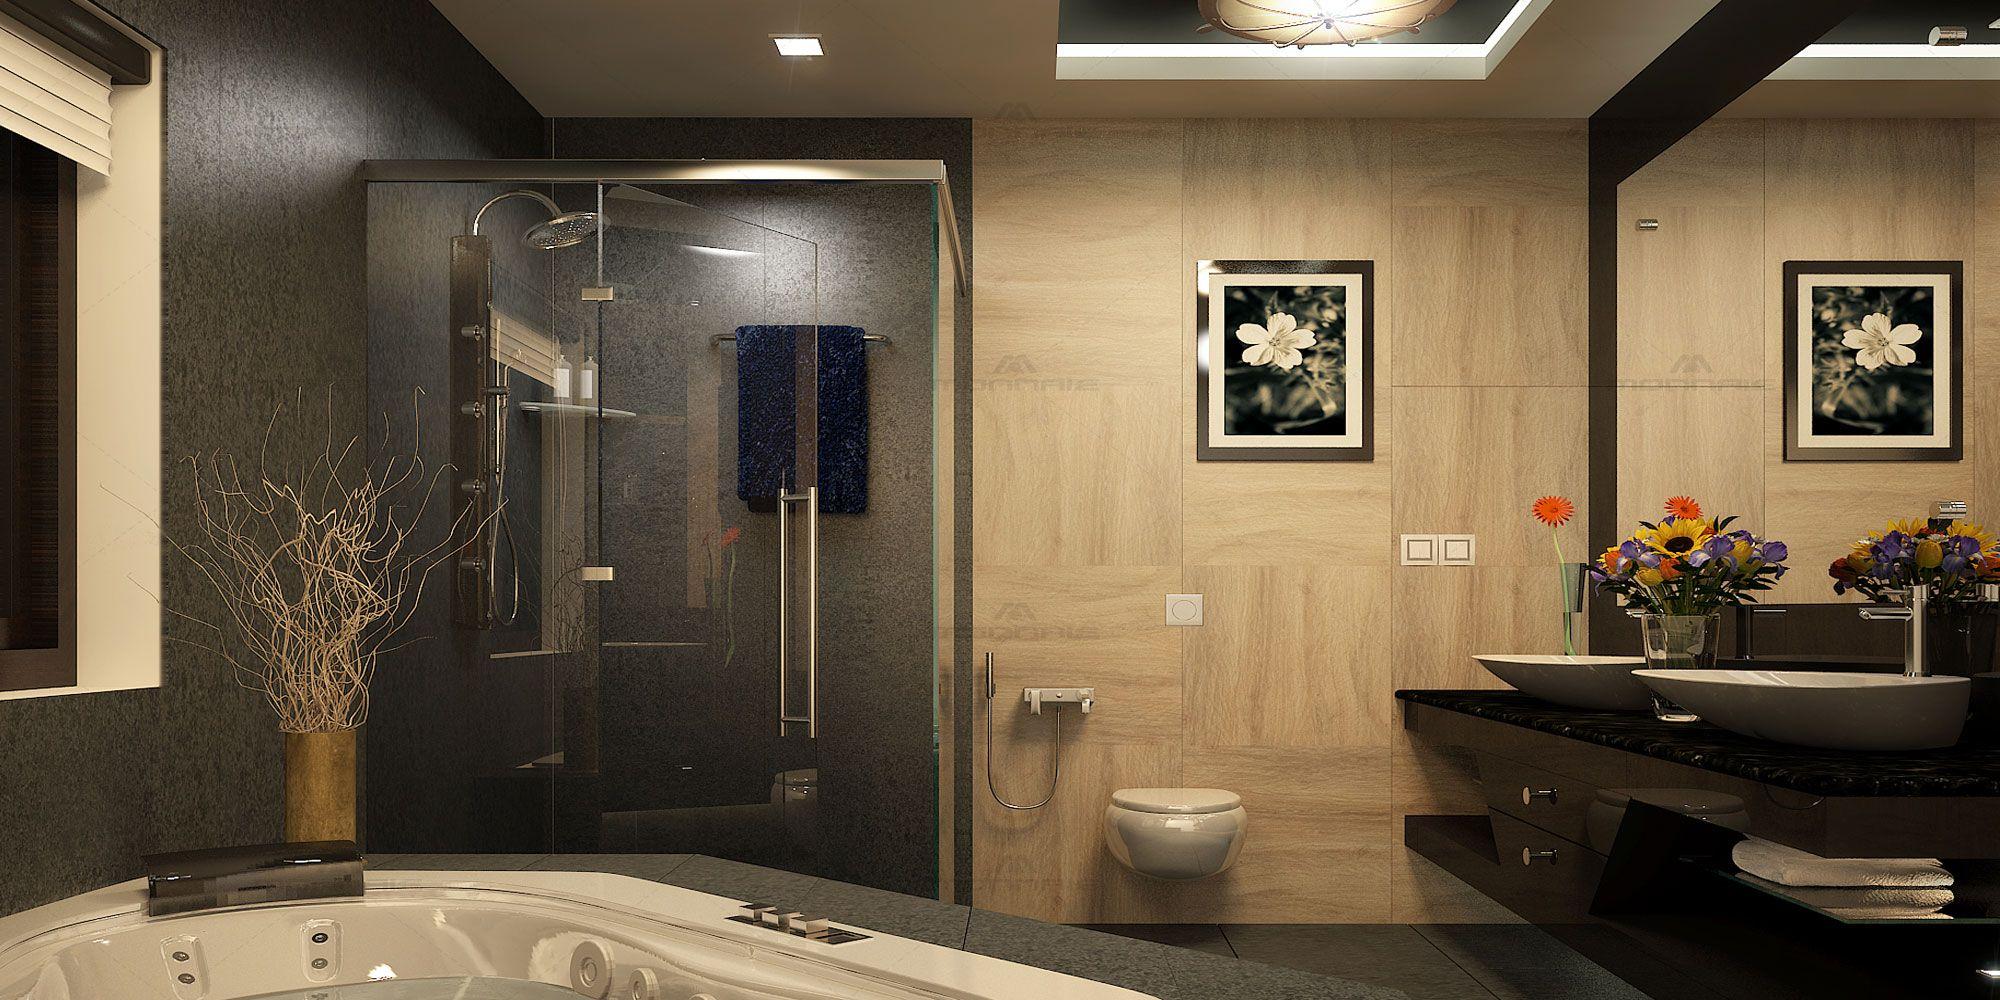 D'life home interiors - kottayam kottayam kerala monnaie architects and interior designers provides low cost bathroom